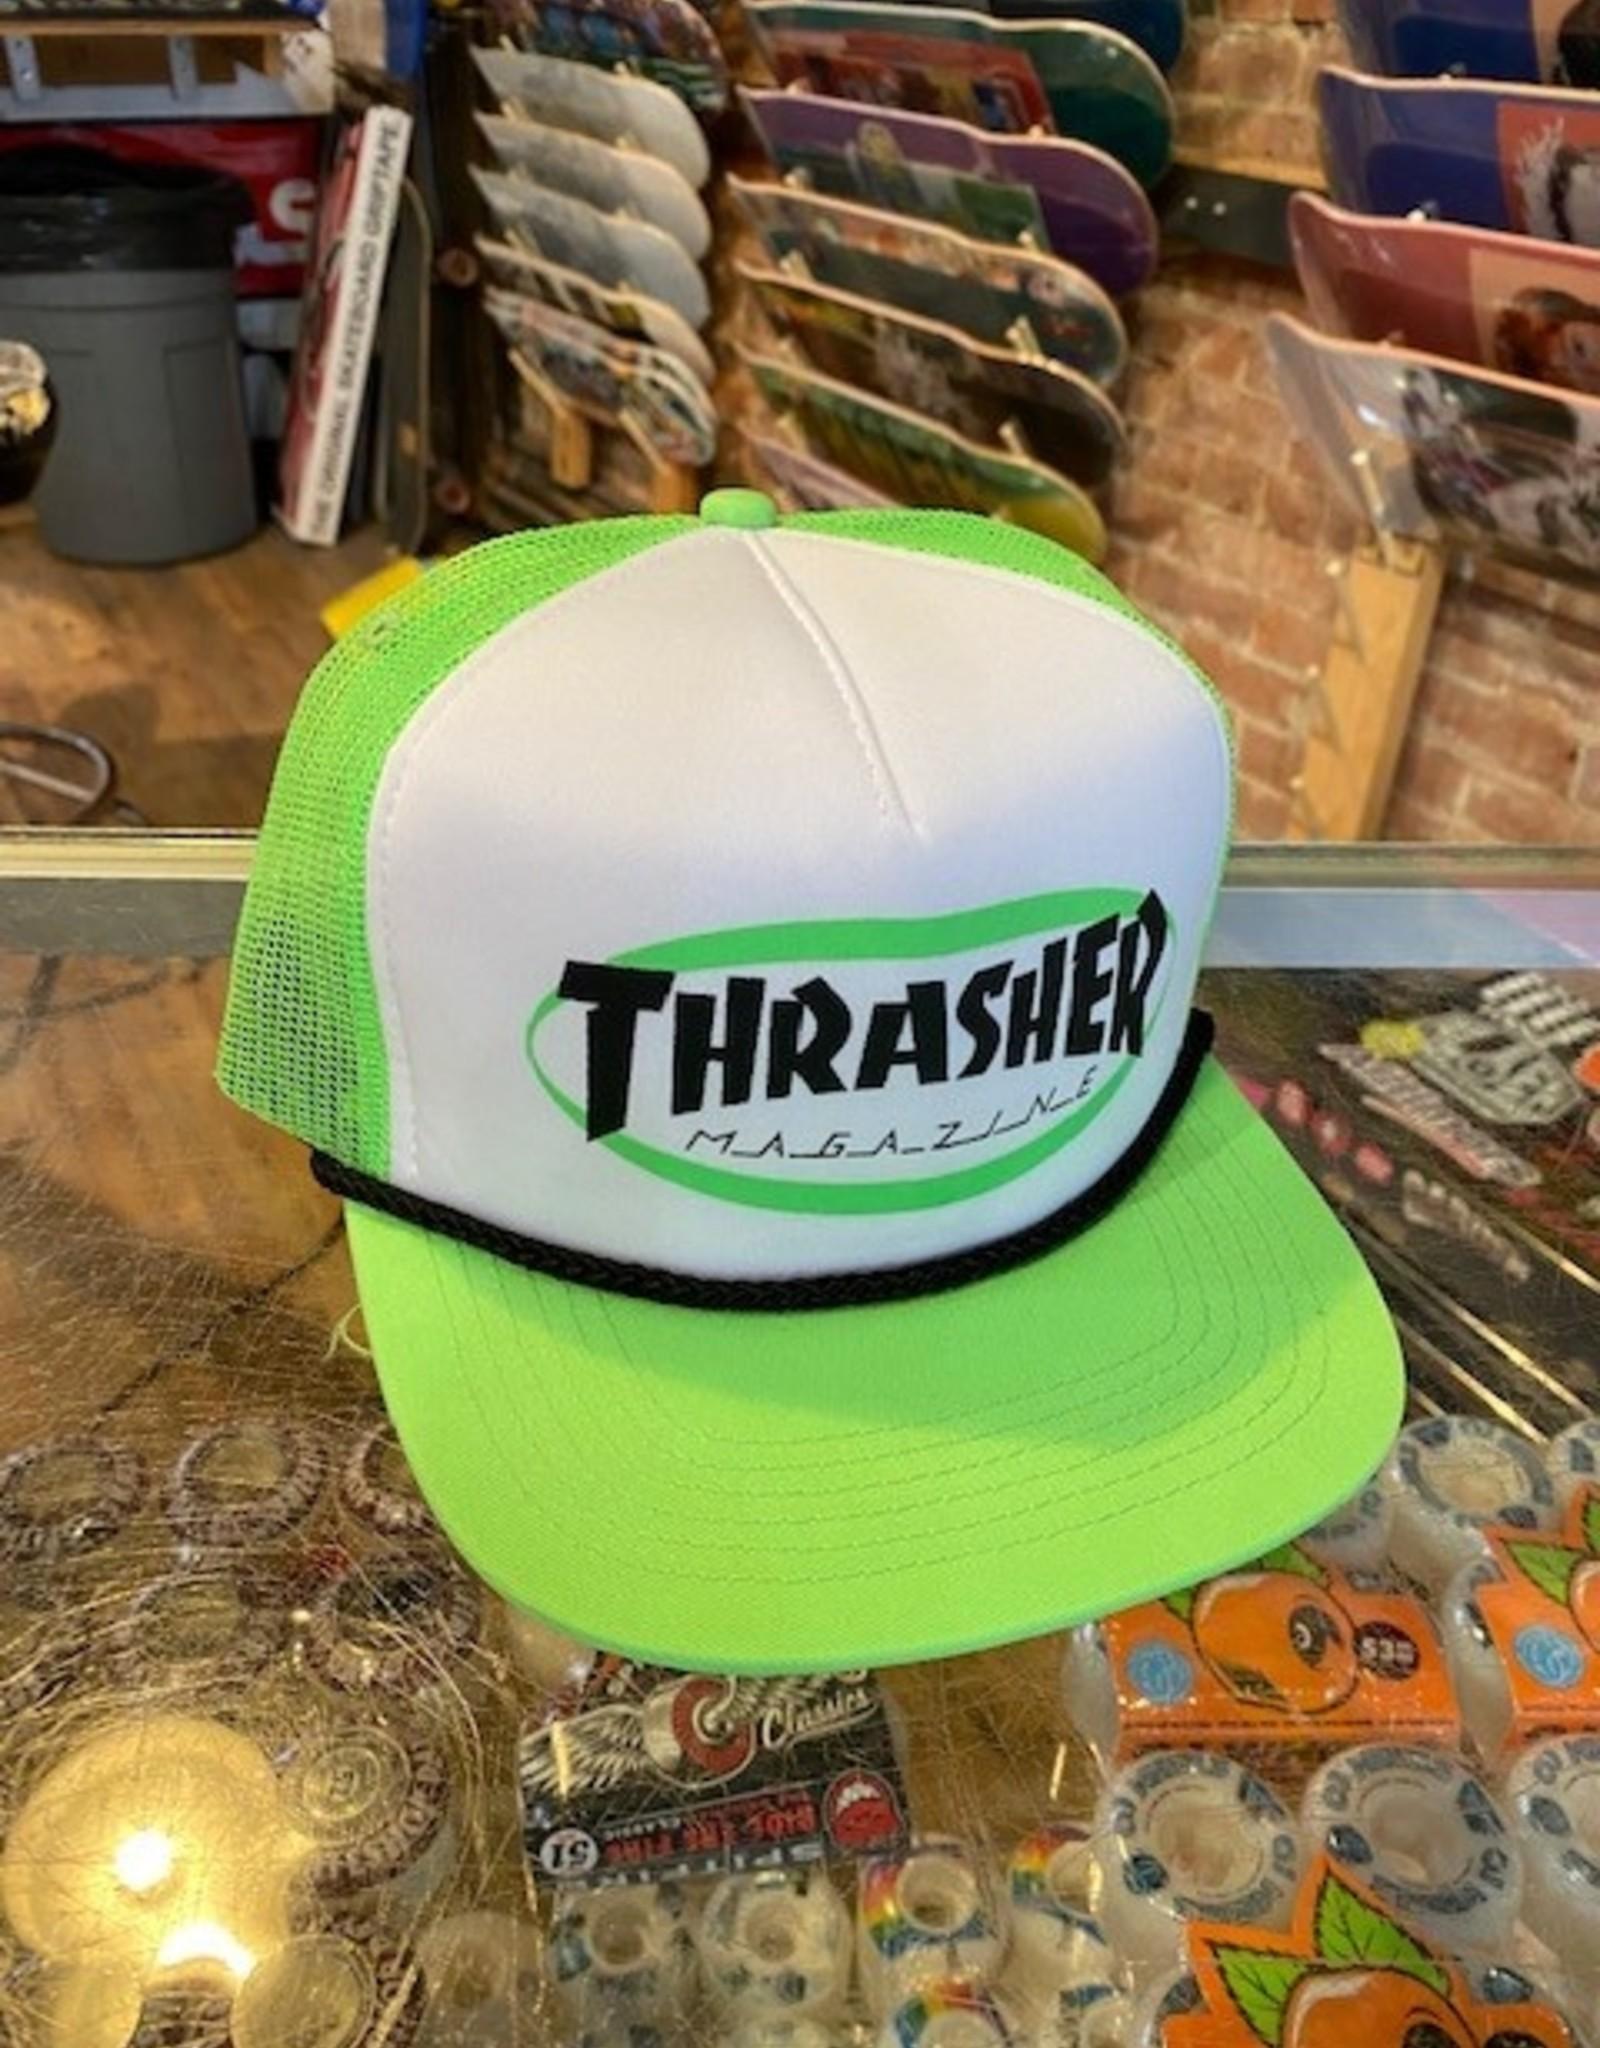 THRASHER THRASHER ELLIPSE MAG LOGO NEON GREEN TURCKER HAT